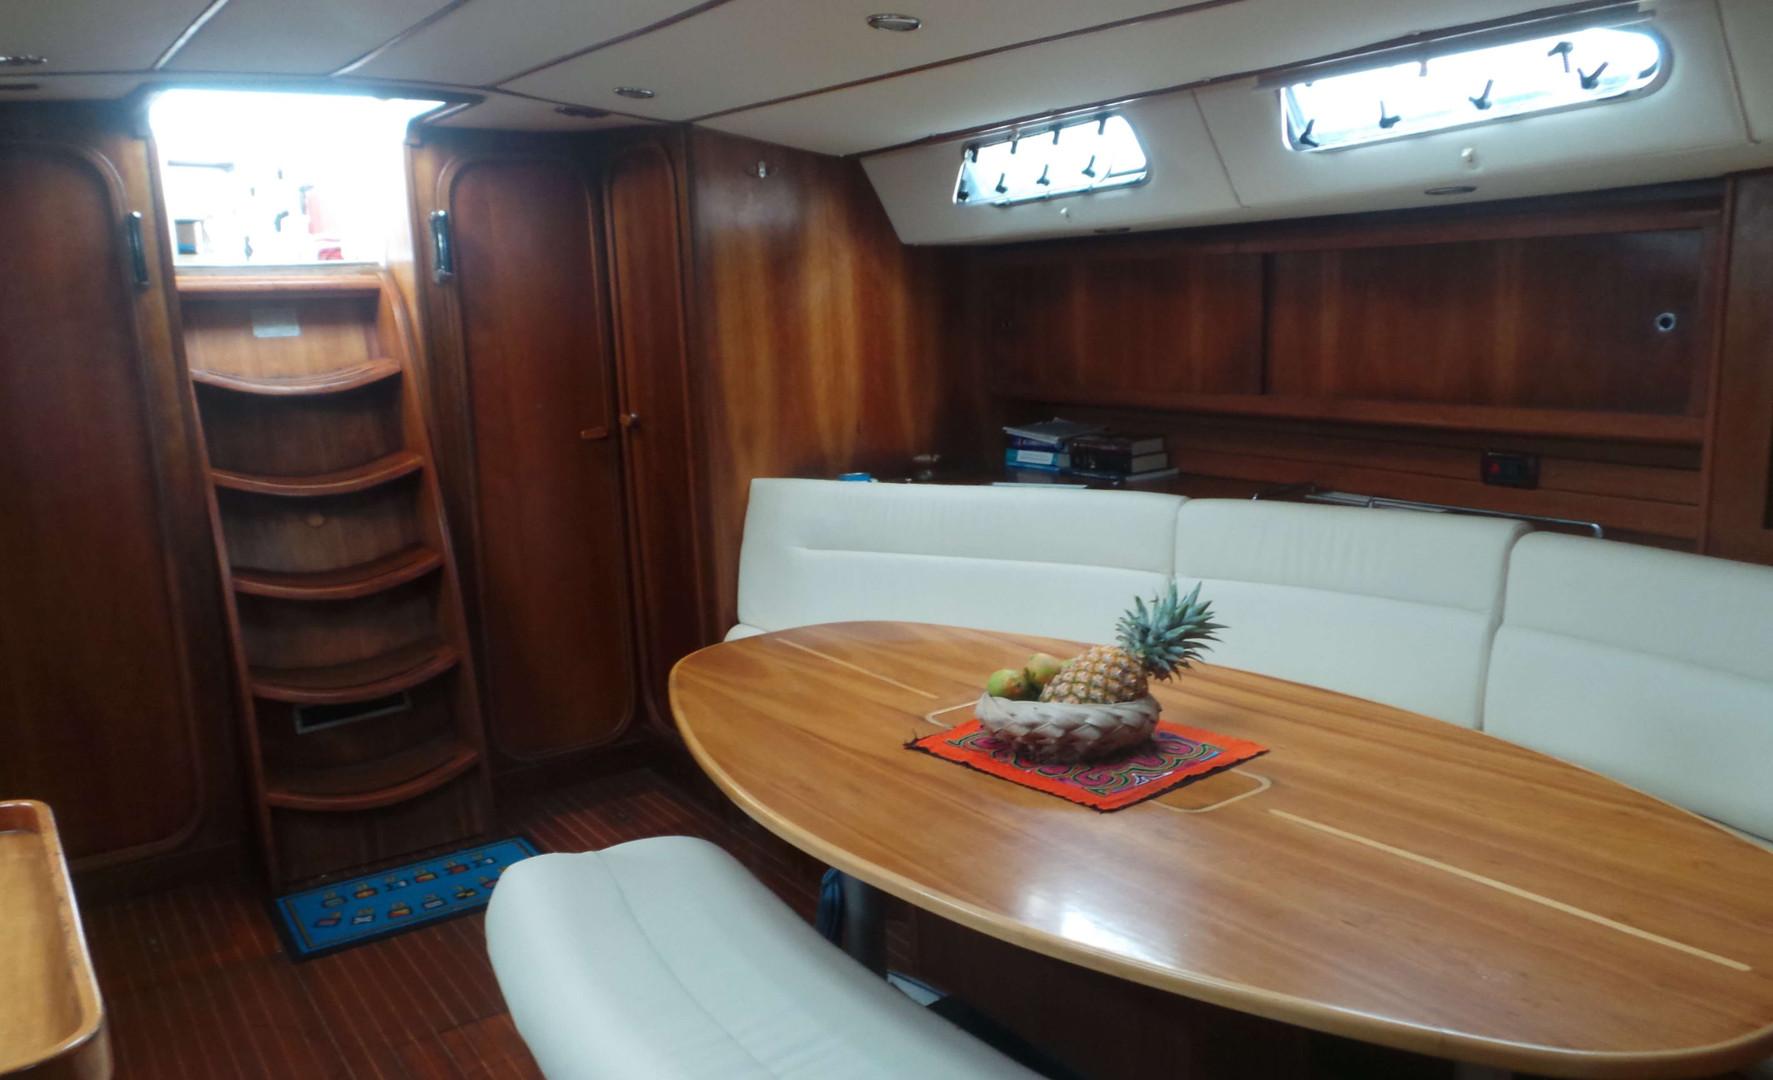 Cockpit voilier finot 53 Polynesie francaise